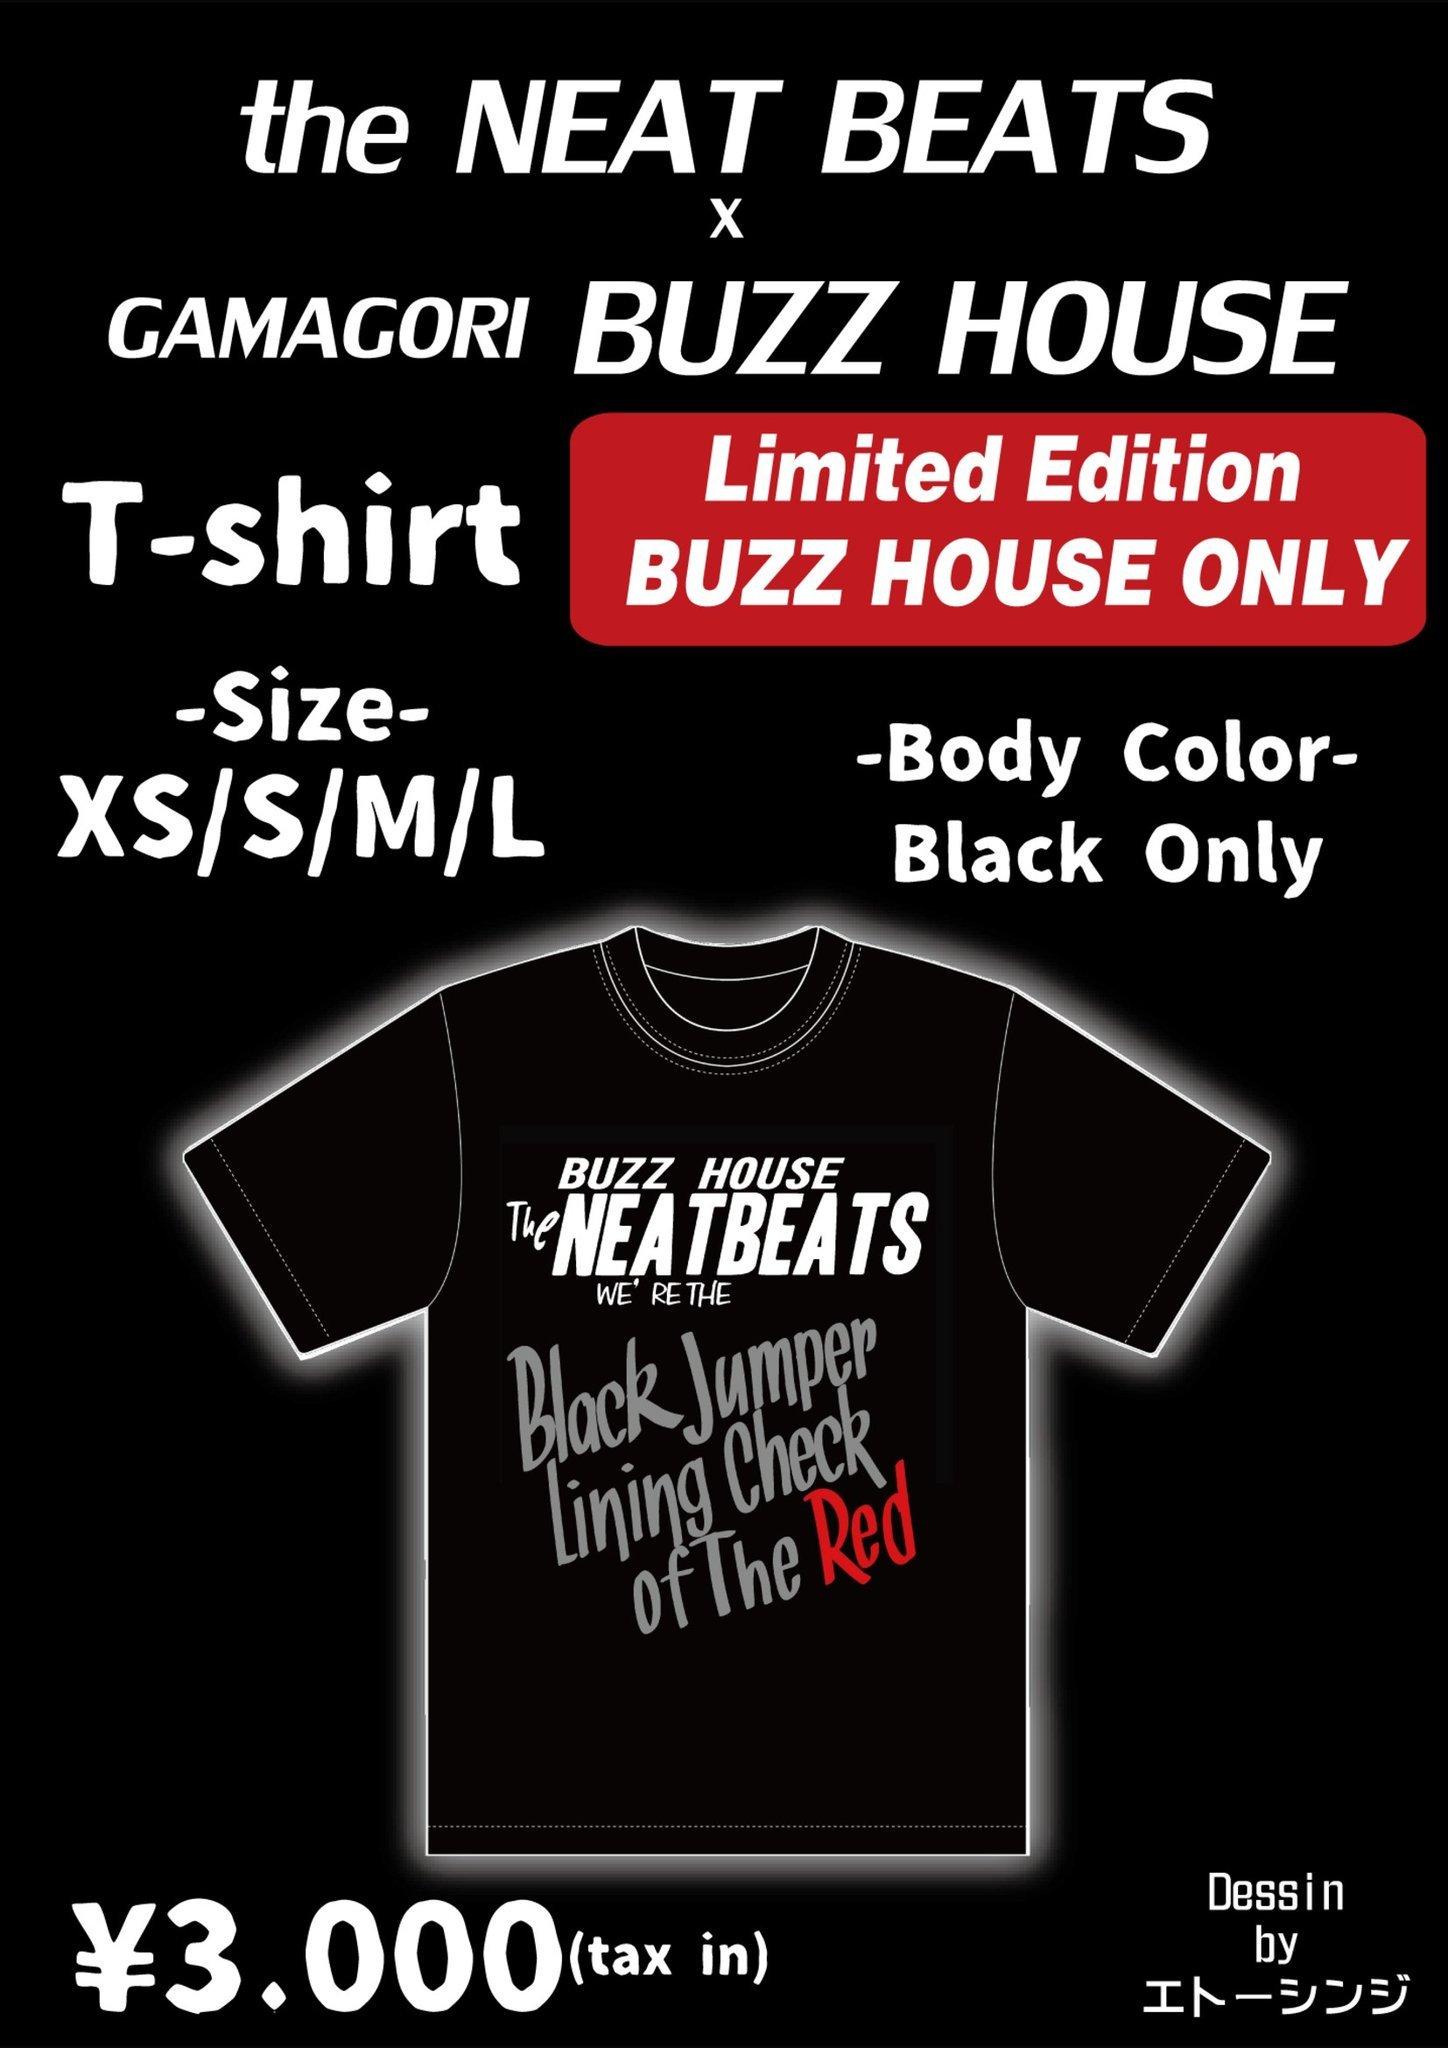 "THE NEATBEATS×BUZZ HOUSE \""Black jumper lining check of the red\"" 蒲郡限定Tシャツ発売!!  _b0123708_09334230.jpg"